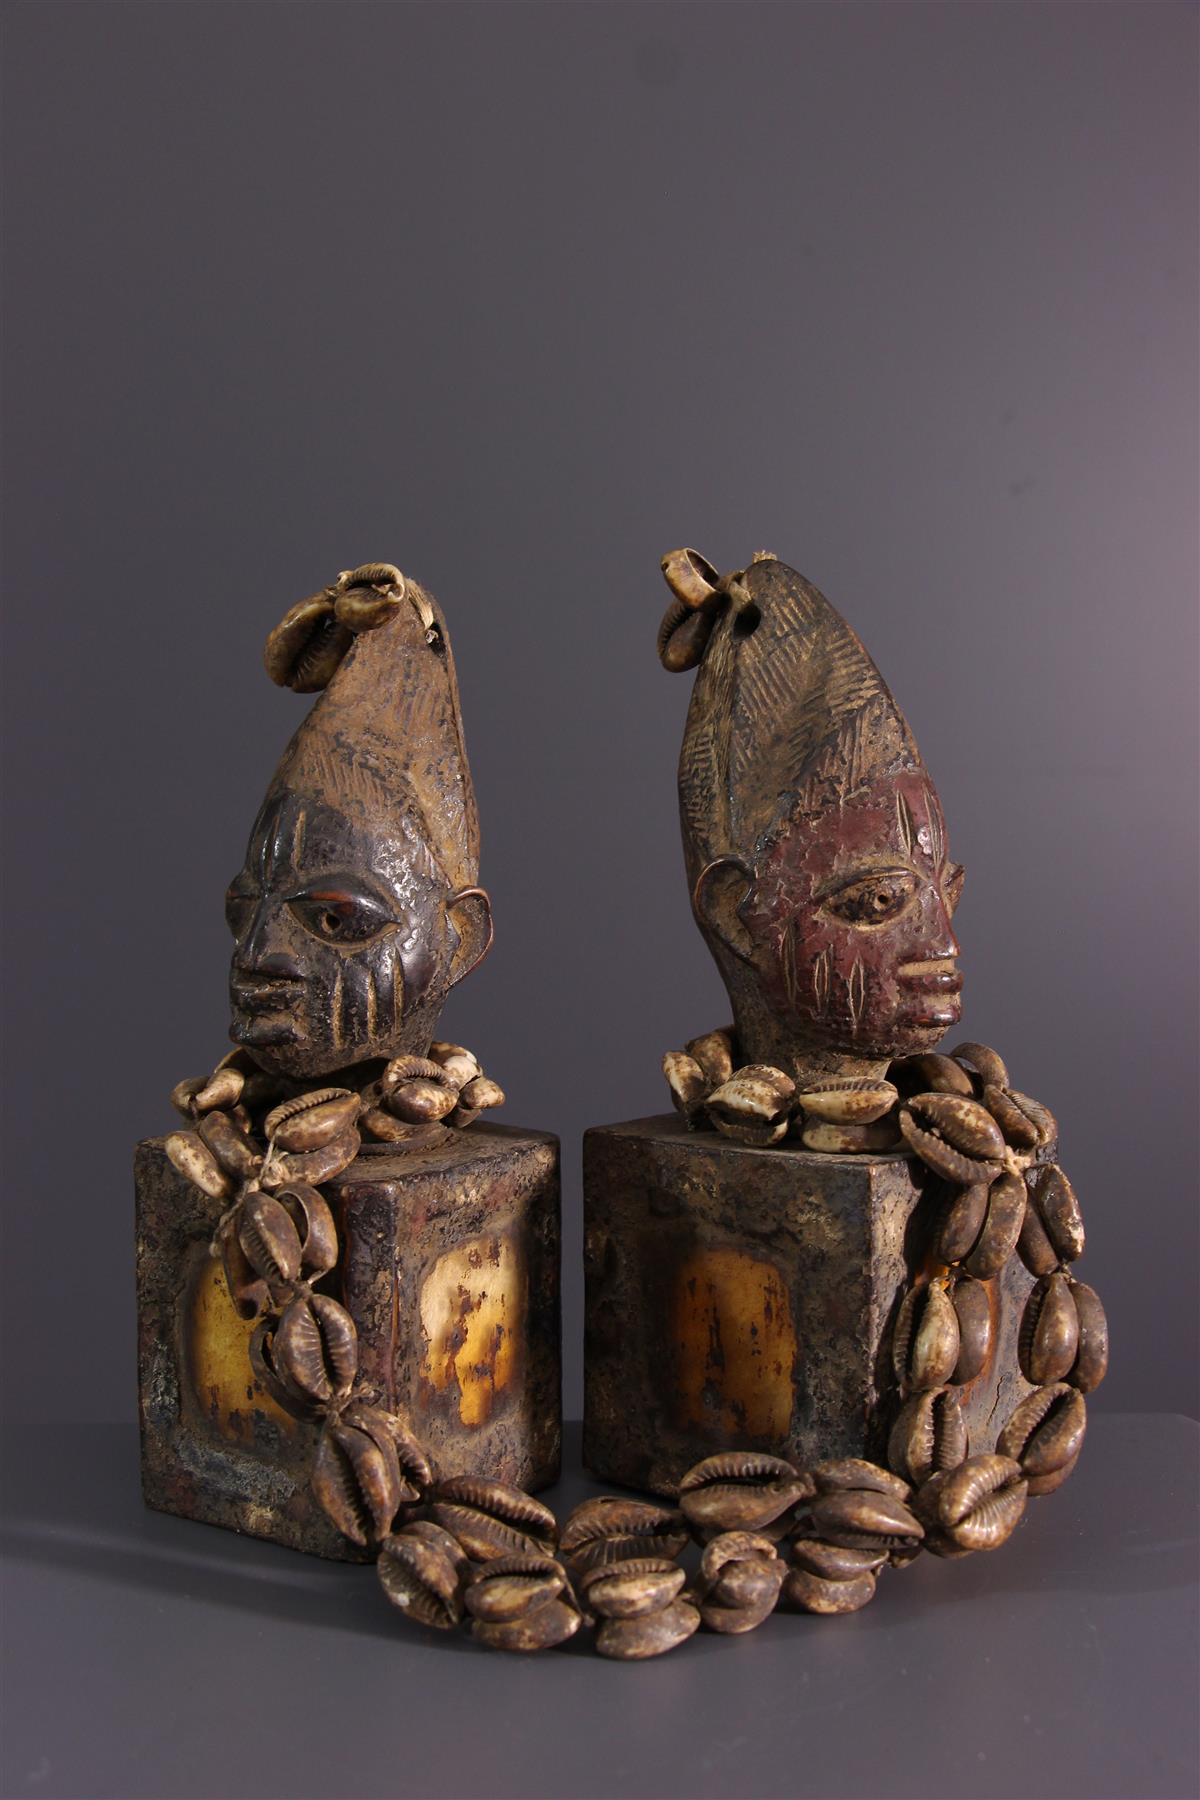 Statuettes Ibeji - African art